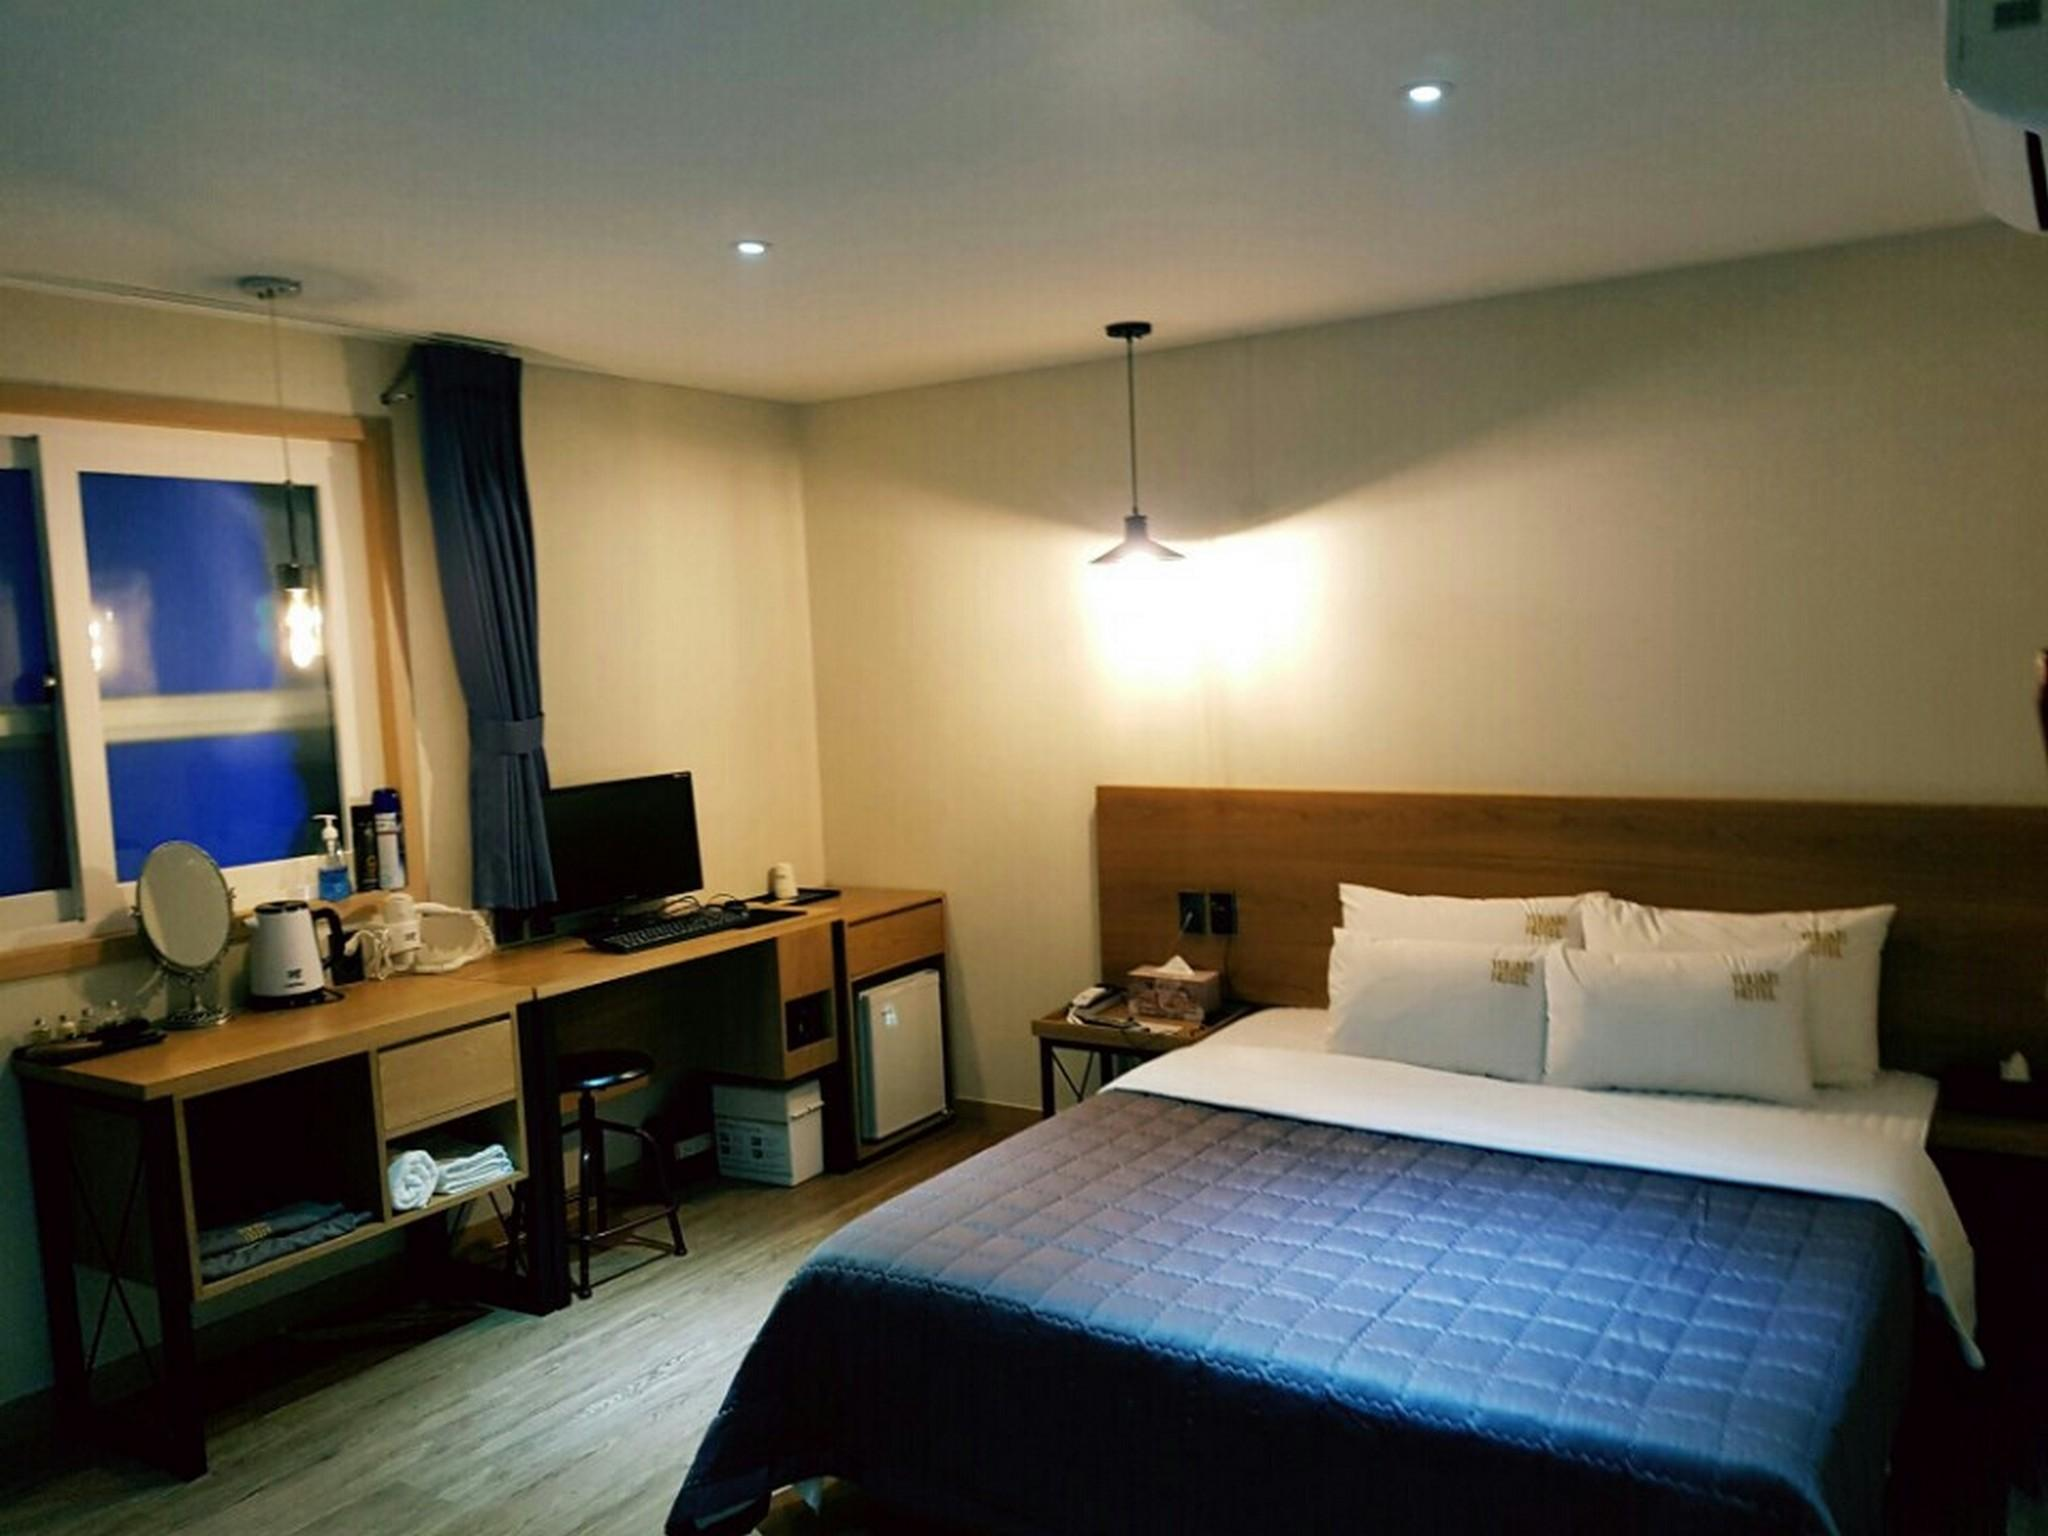 Hotel YouAIn Oncheon, Geumjeong